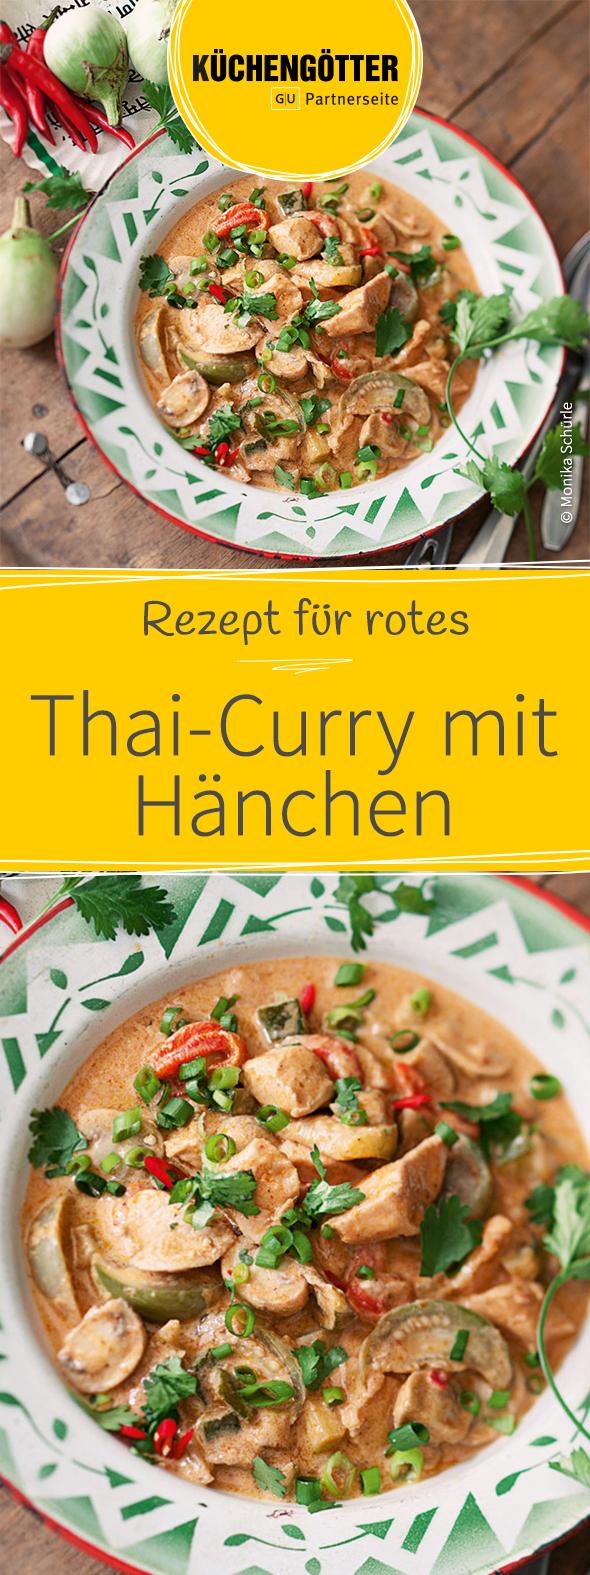 Rotes Thai-Curry mit Hähnchen #thaifoodrecipes